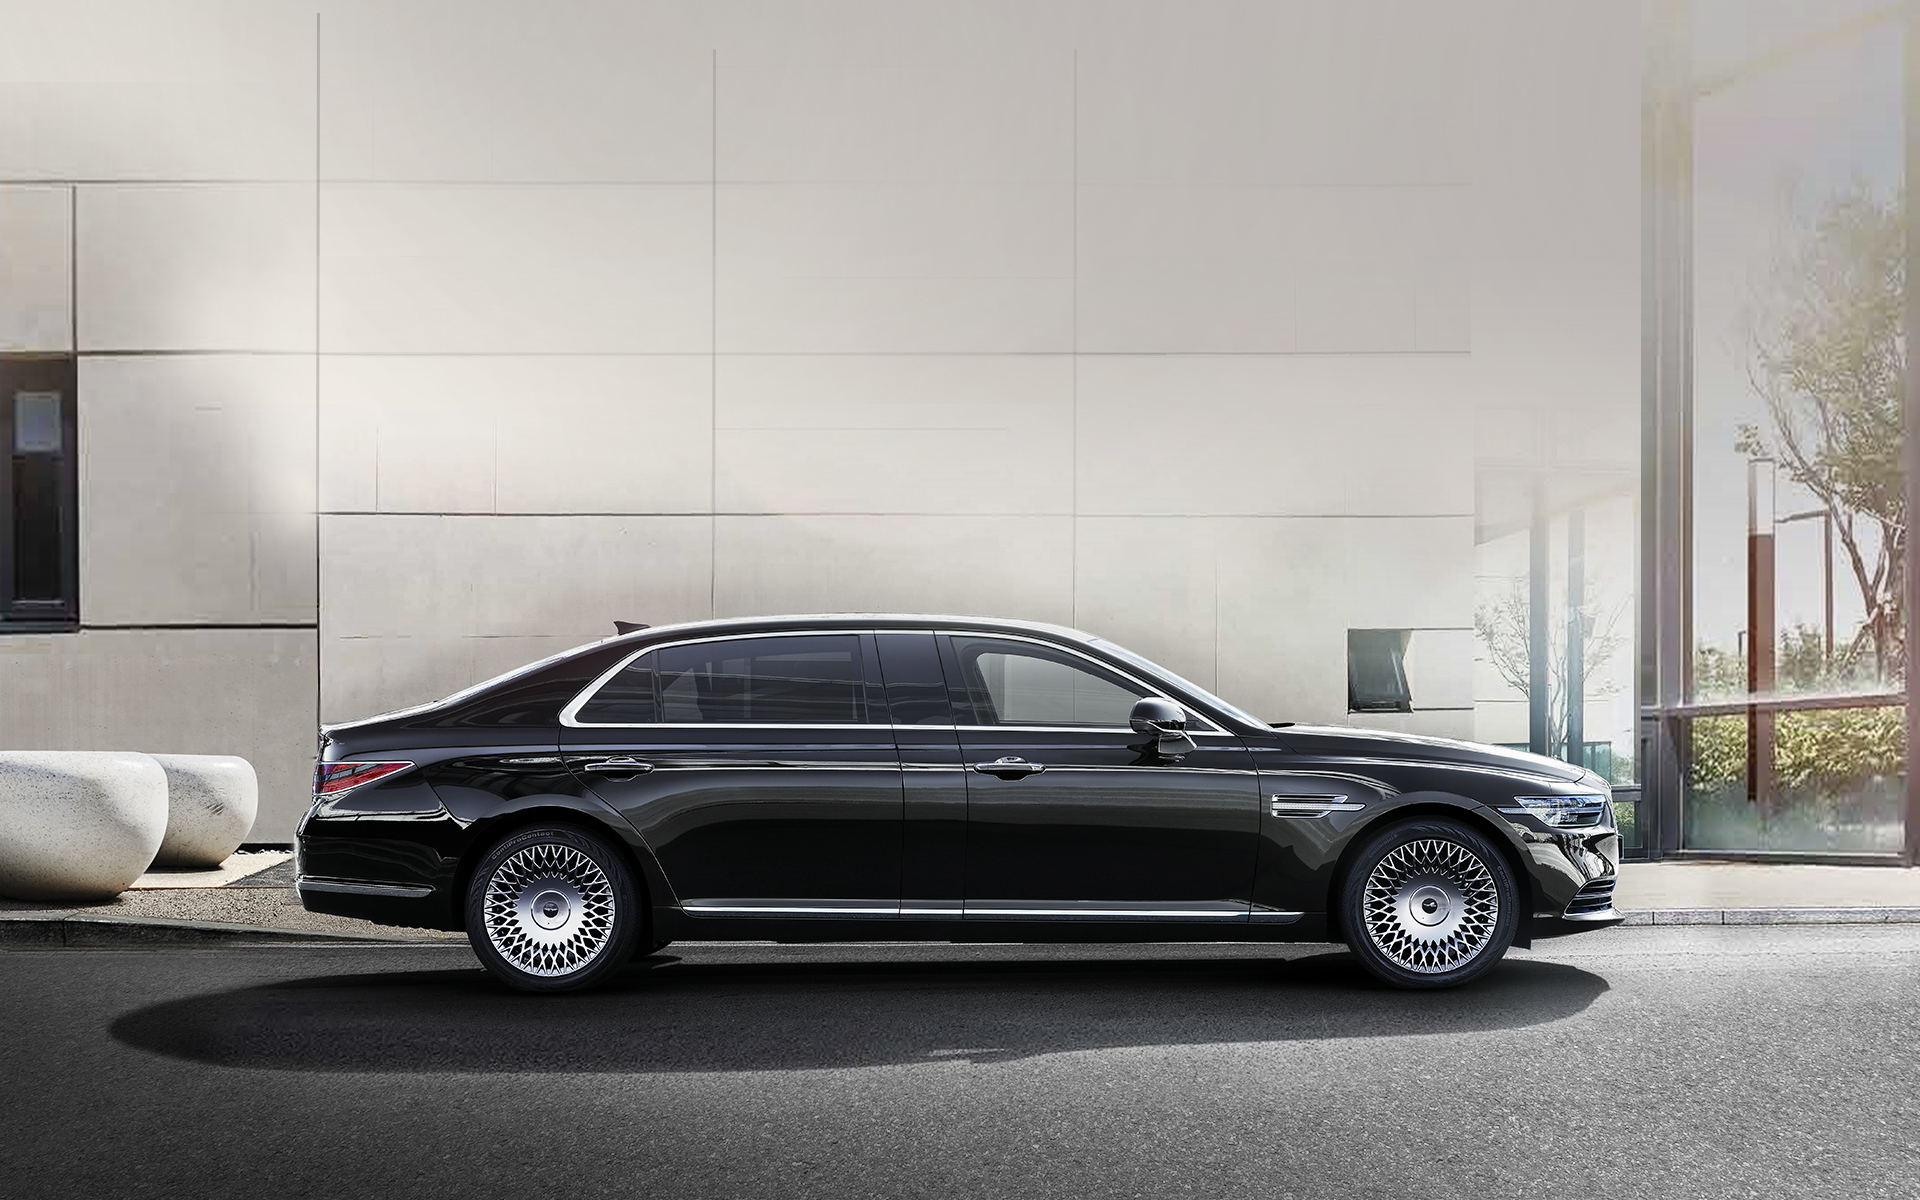 genesis-g90-highlights-design-limo.jpg